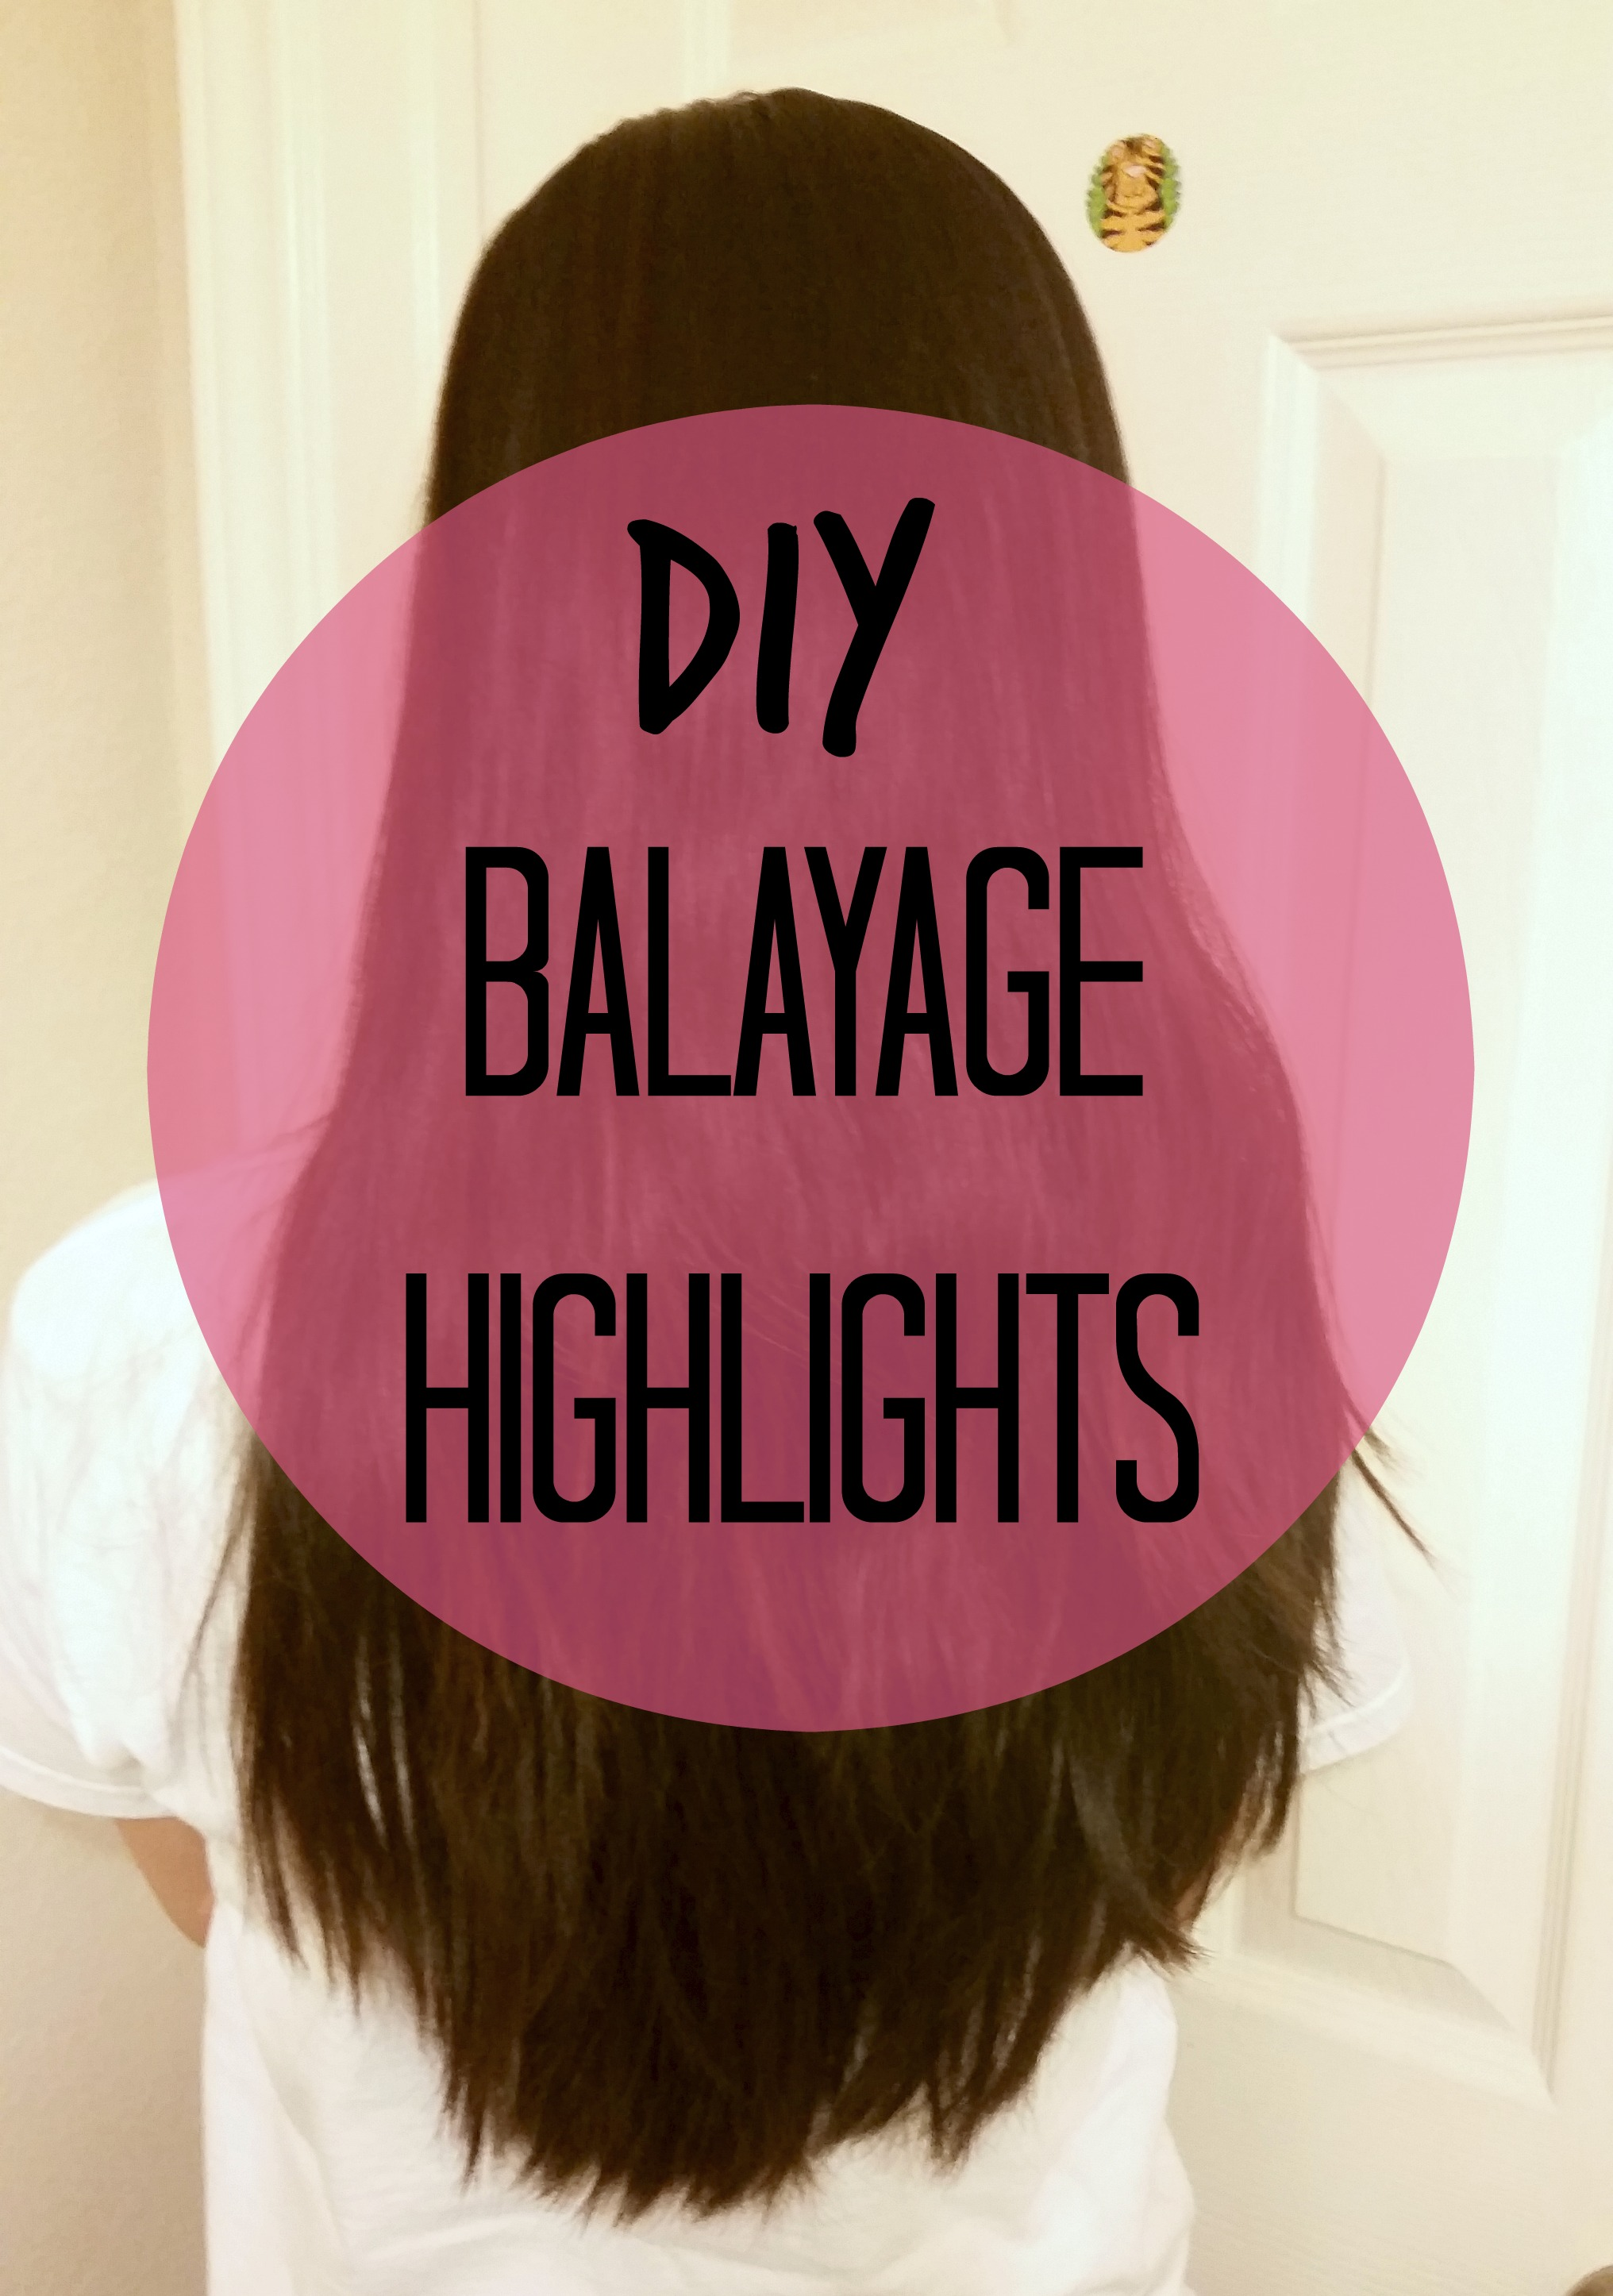 Diy balayage highlights juleps tea diy balayage highlights solutioingenieria Choice Image